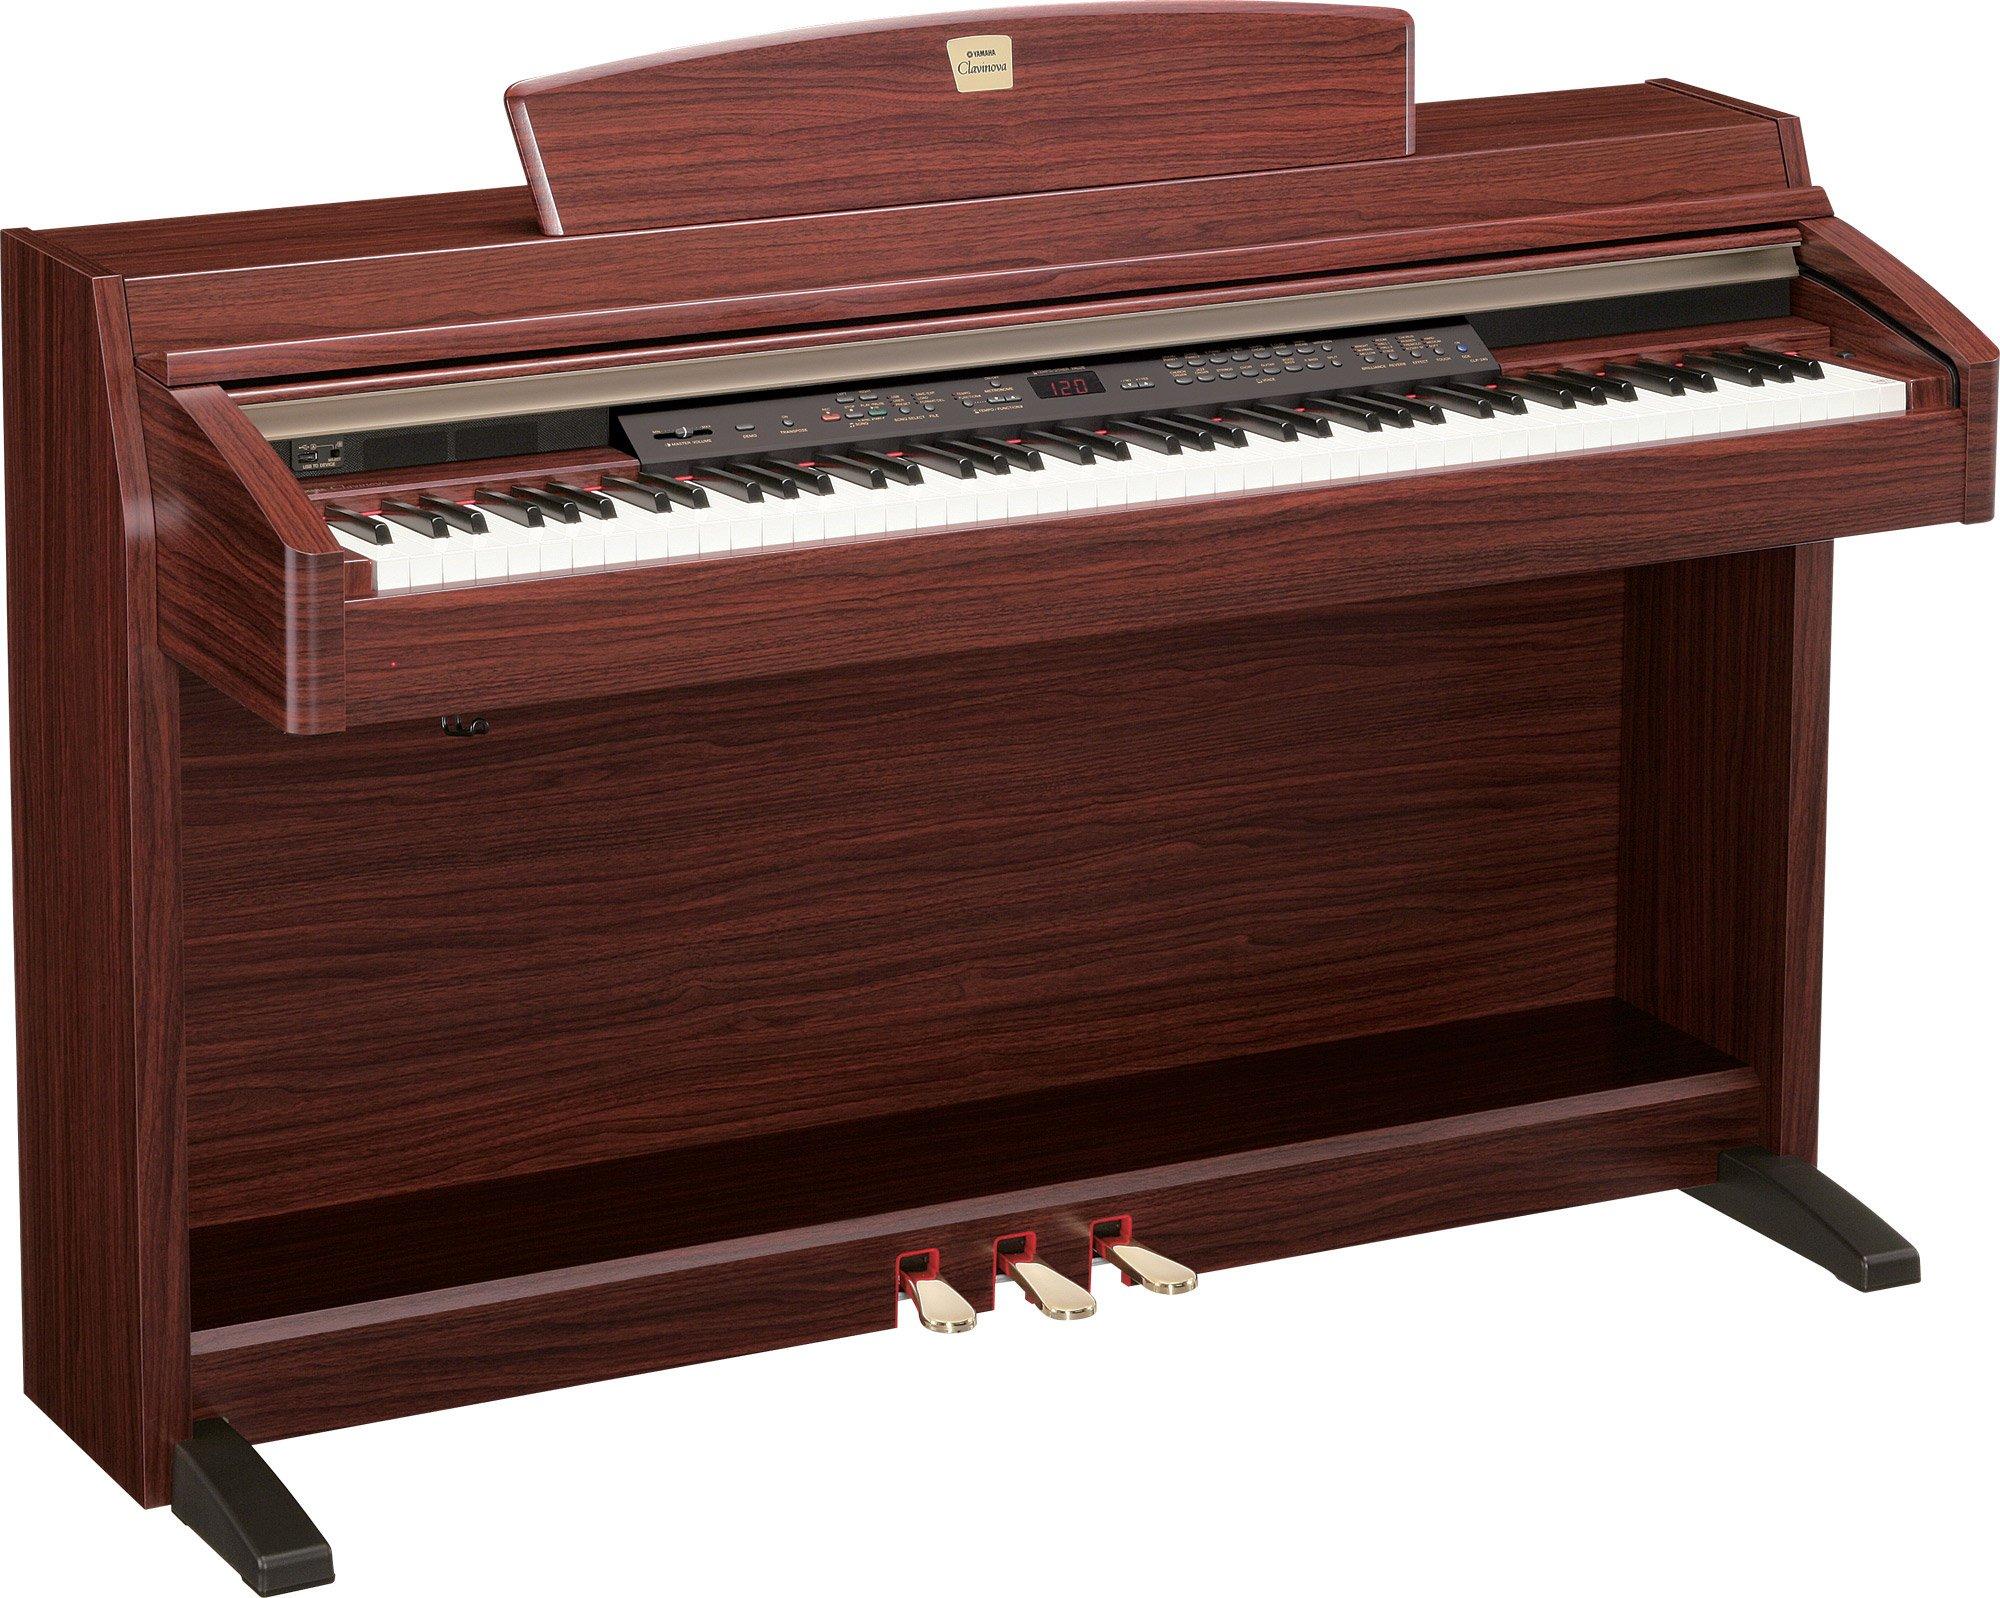 piano cu, piano dien cu, piano second hand